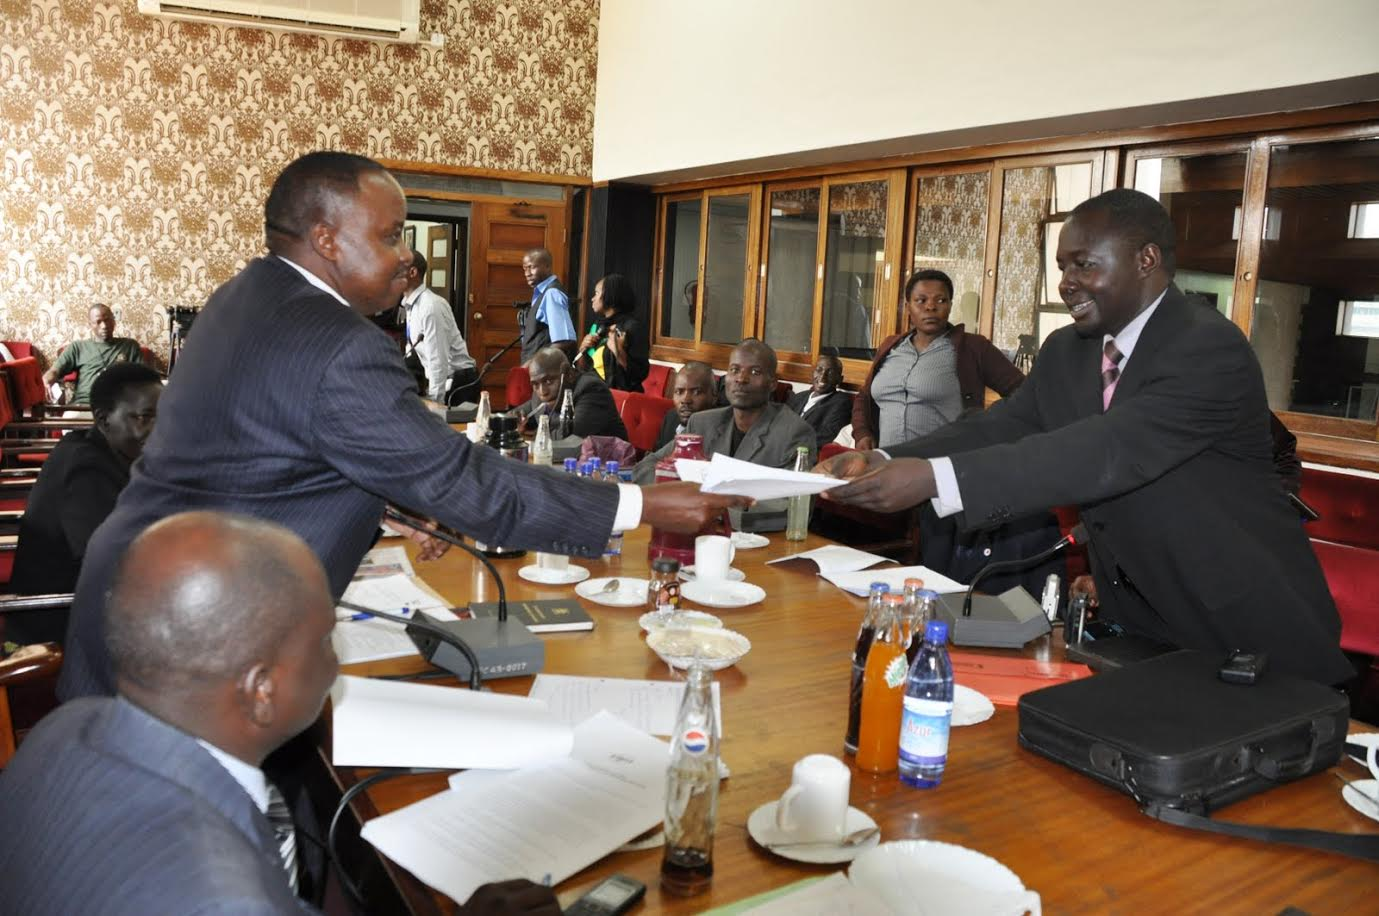 Kikonyogo Kivumbi of the Uganda Health and Science Press Association presents a petition to the parliament's HIV committee. (Photo courtesy of Kikonyogo Kivumbi)